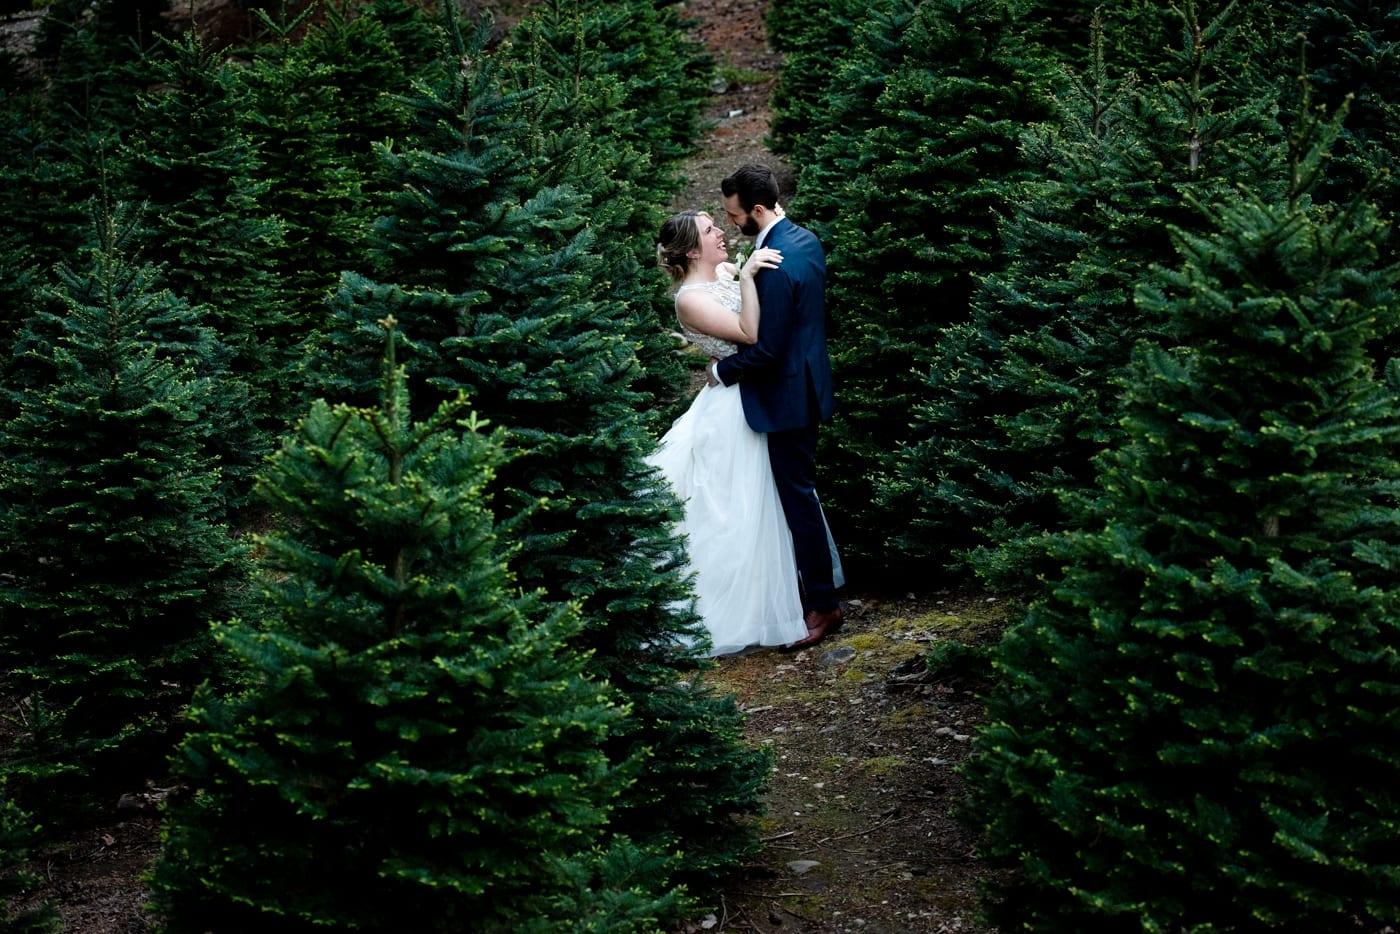 Couple-Amongst-Pines-Trinity-Tree-Farm-Wedding-Photos-Greener-Visuals